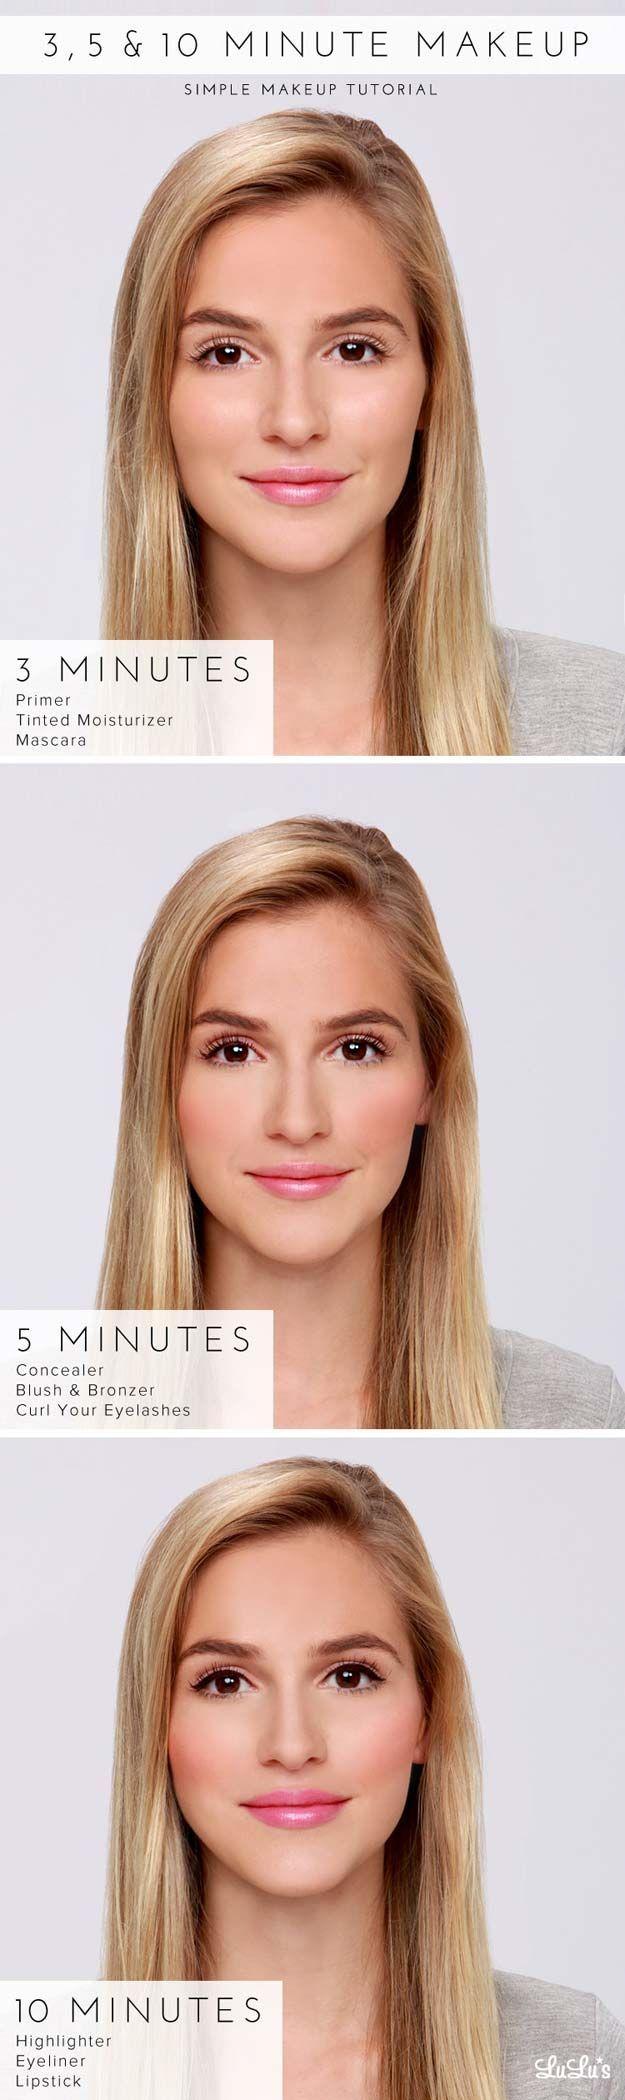 Best Makeup Tutorials for Teens -How-To: 3, 5 & 10 Minute Makeup Tutorial - Easy...